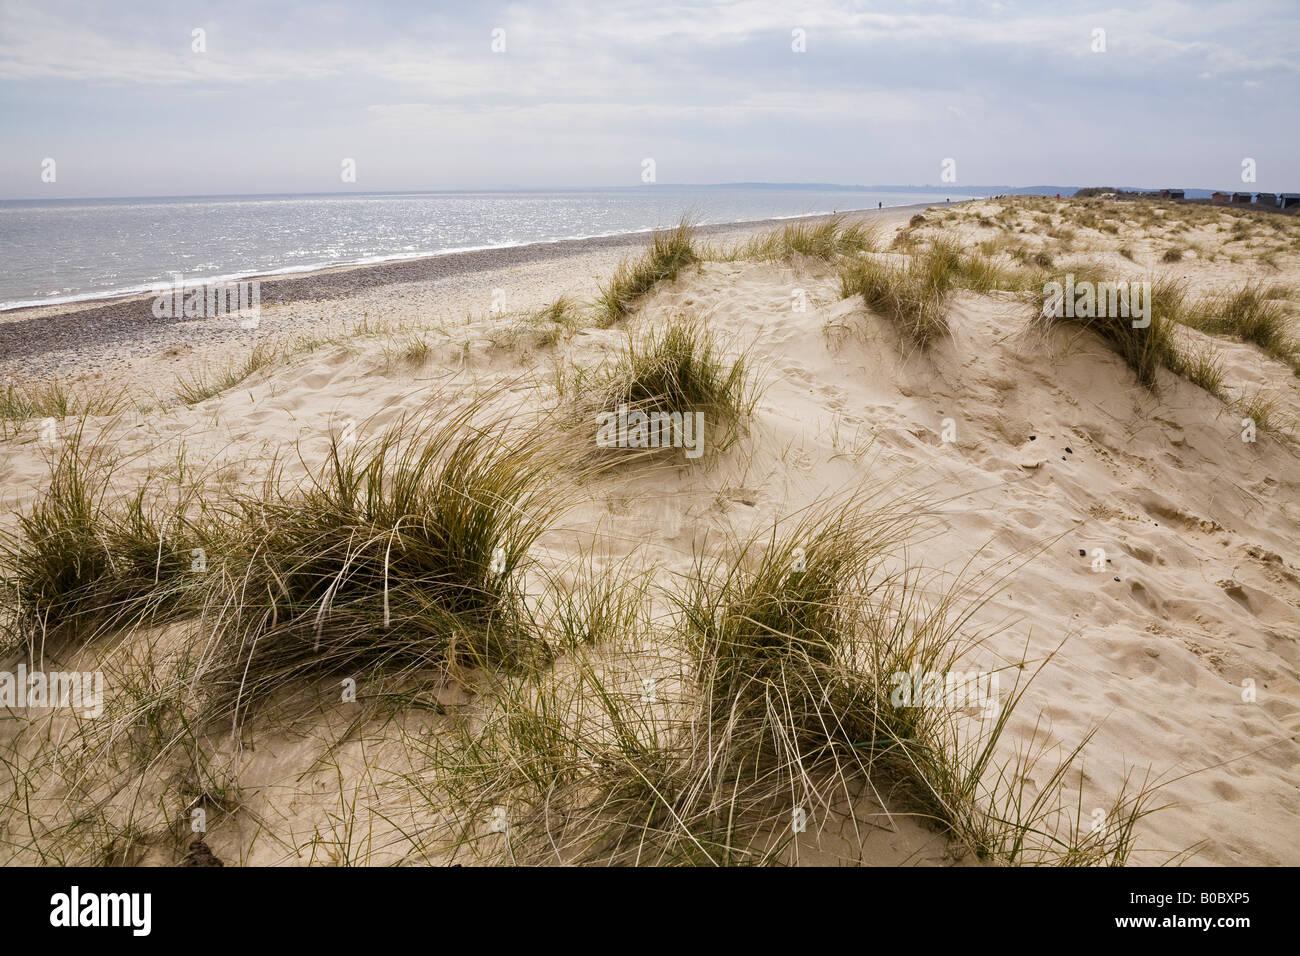 The beach and sand dunes, Walberswick, Suffolk, England - Stock Image